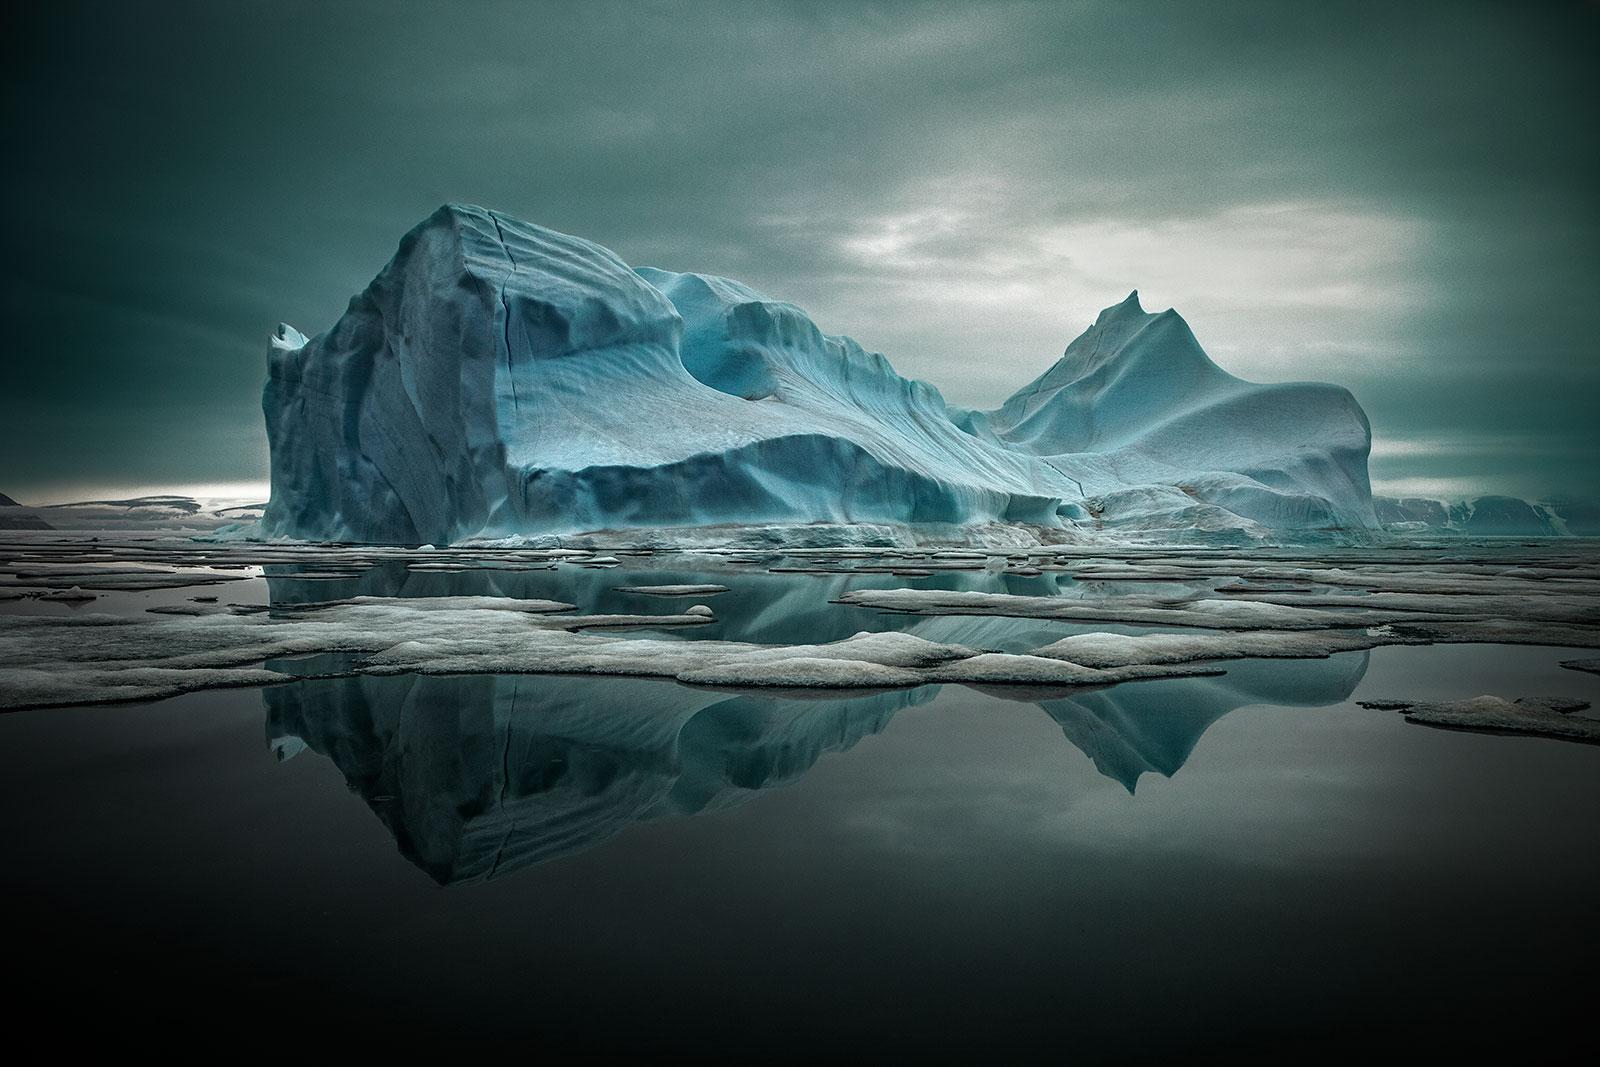 iceberg with reflection